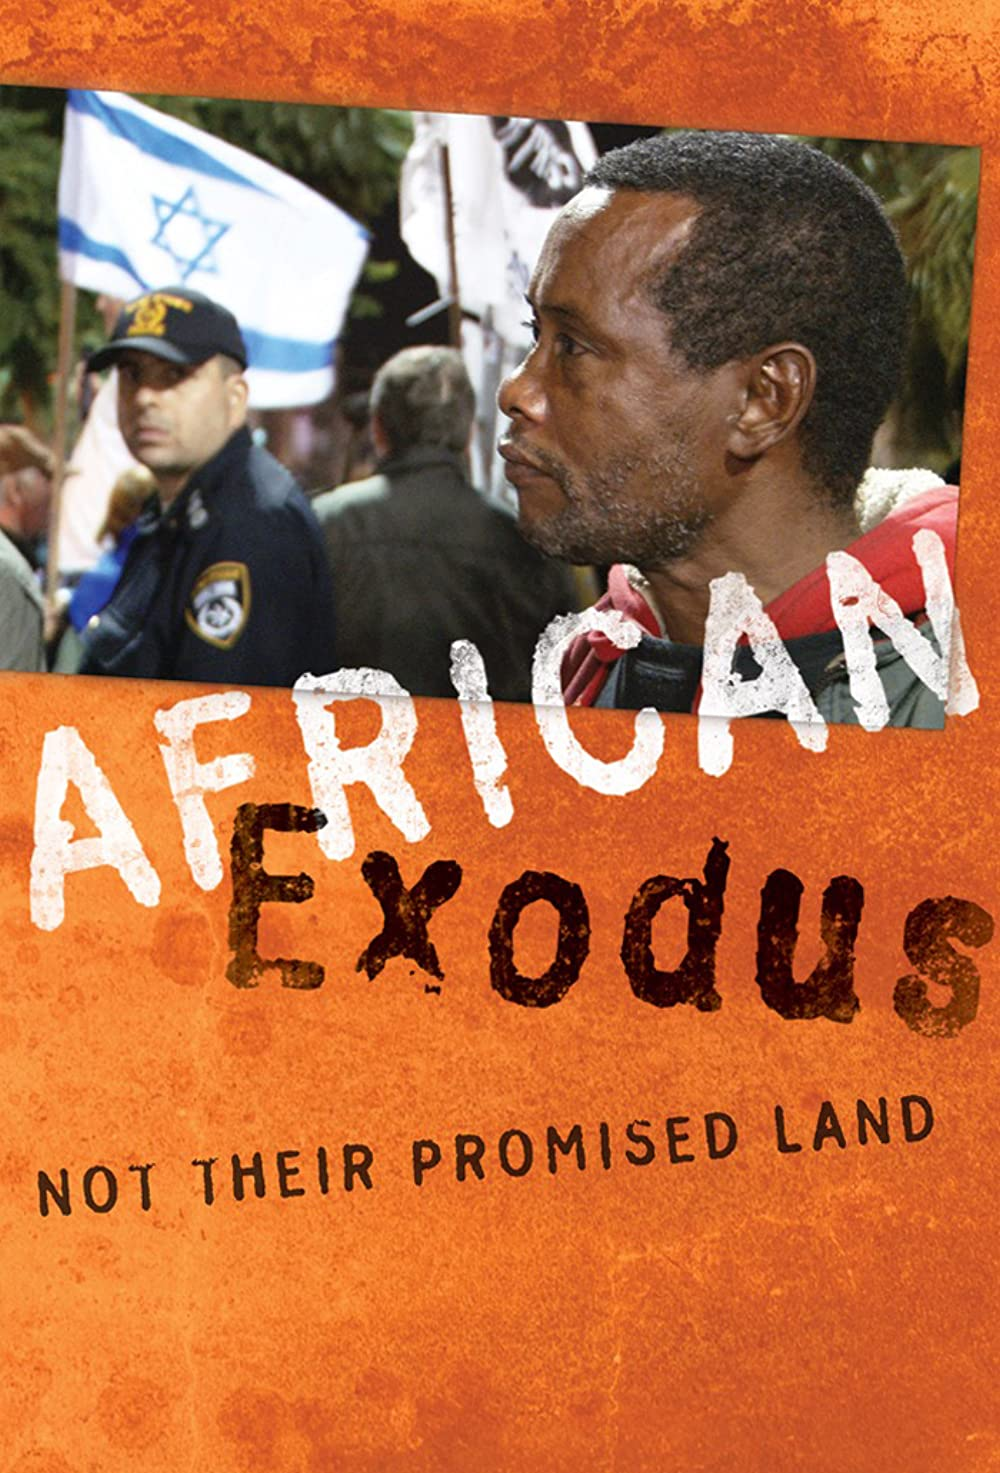 African Exodus image